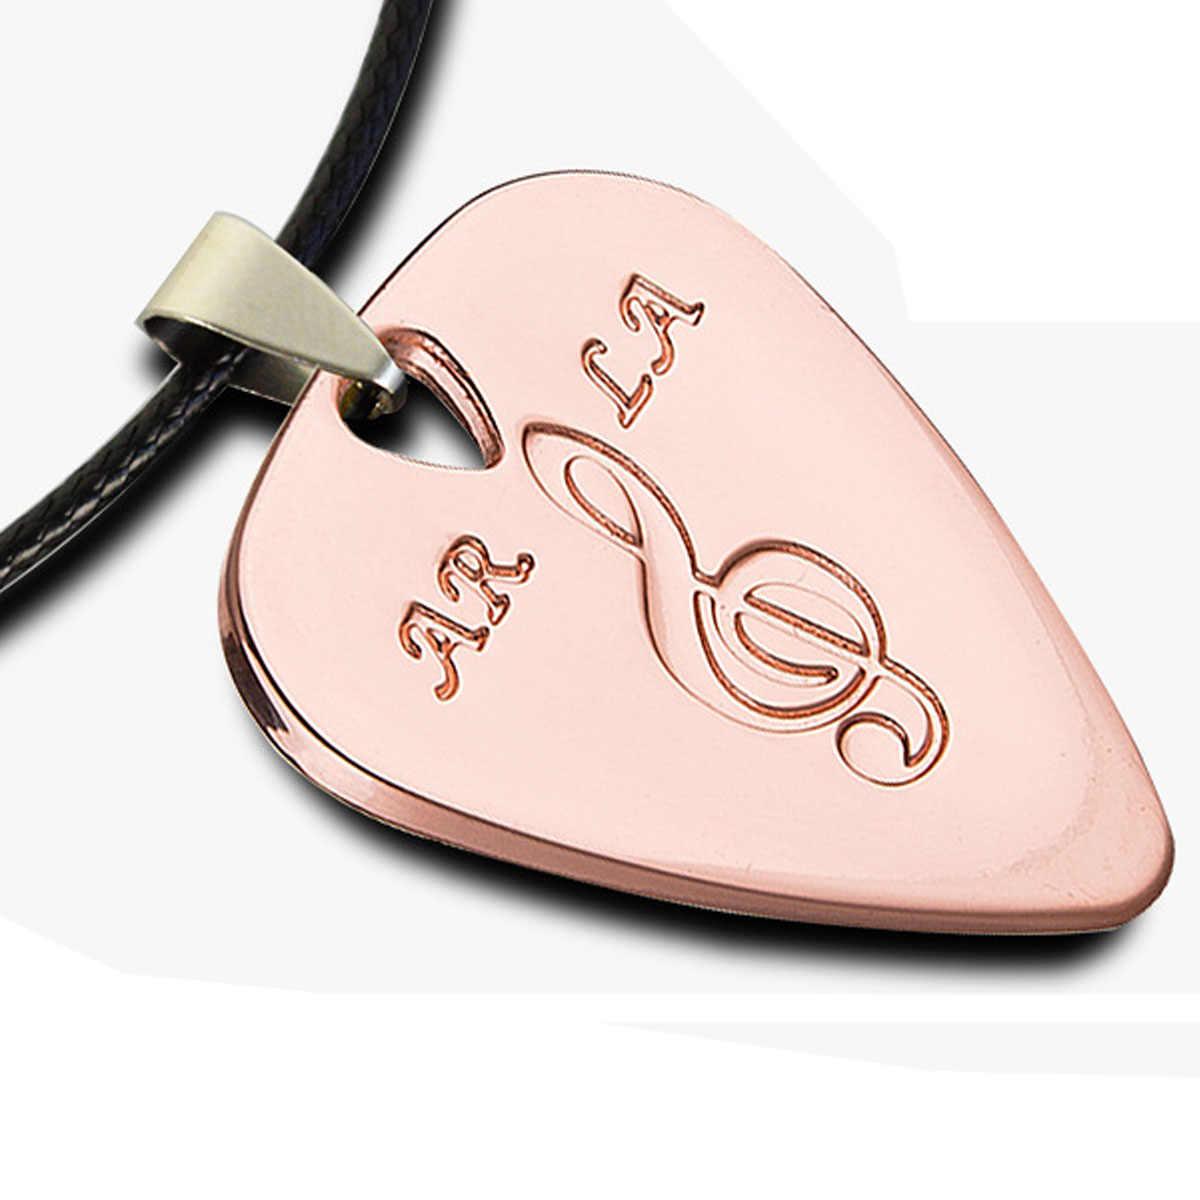 1Pcs מתכת גיטרה פיק 0.38mm דק עמיד כסף צבע מקצועי בס Ukelele גיטרה מבחר